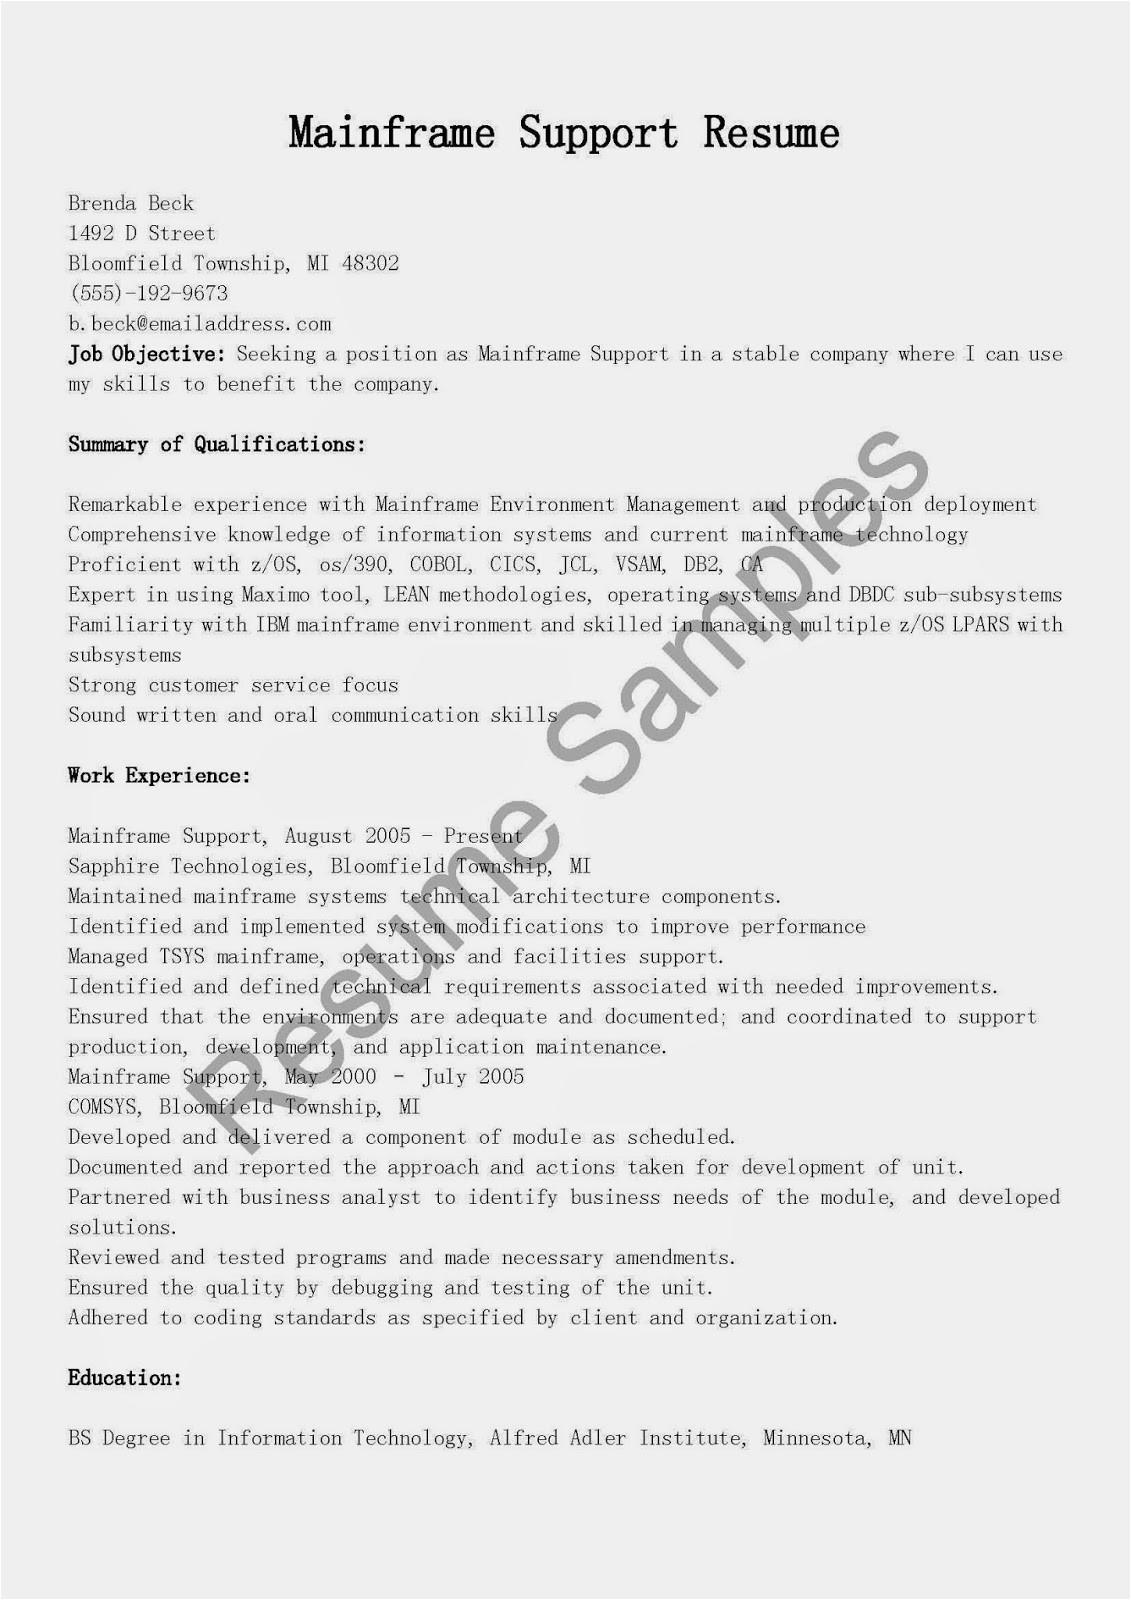 mainframe support resume sample